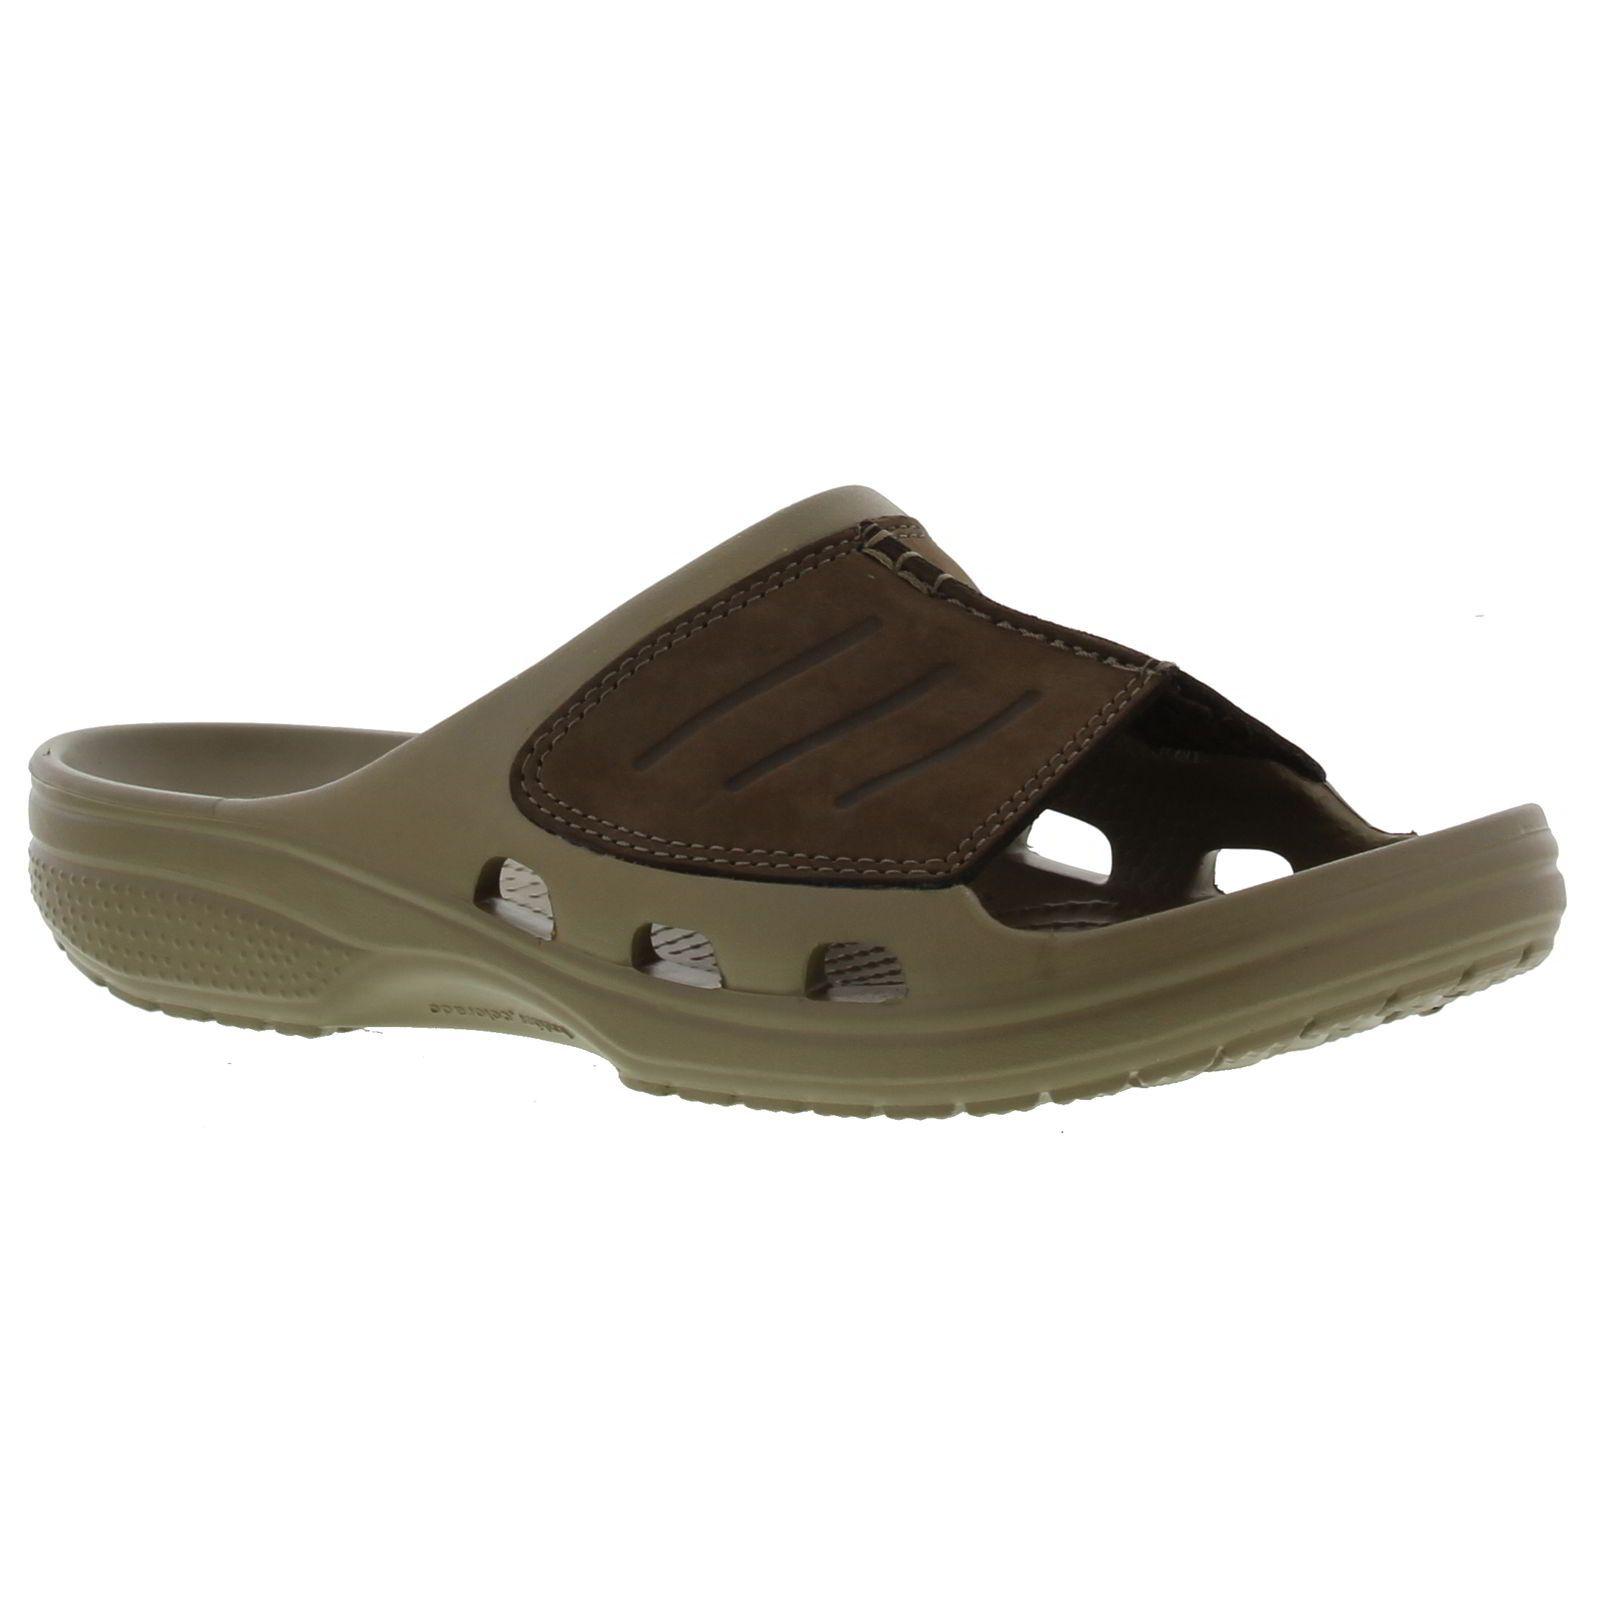 2a0fbebb7aaa Crocs Mens Yukon Mesa Slide FlipFlop - Khaki Espresso